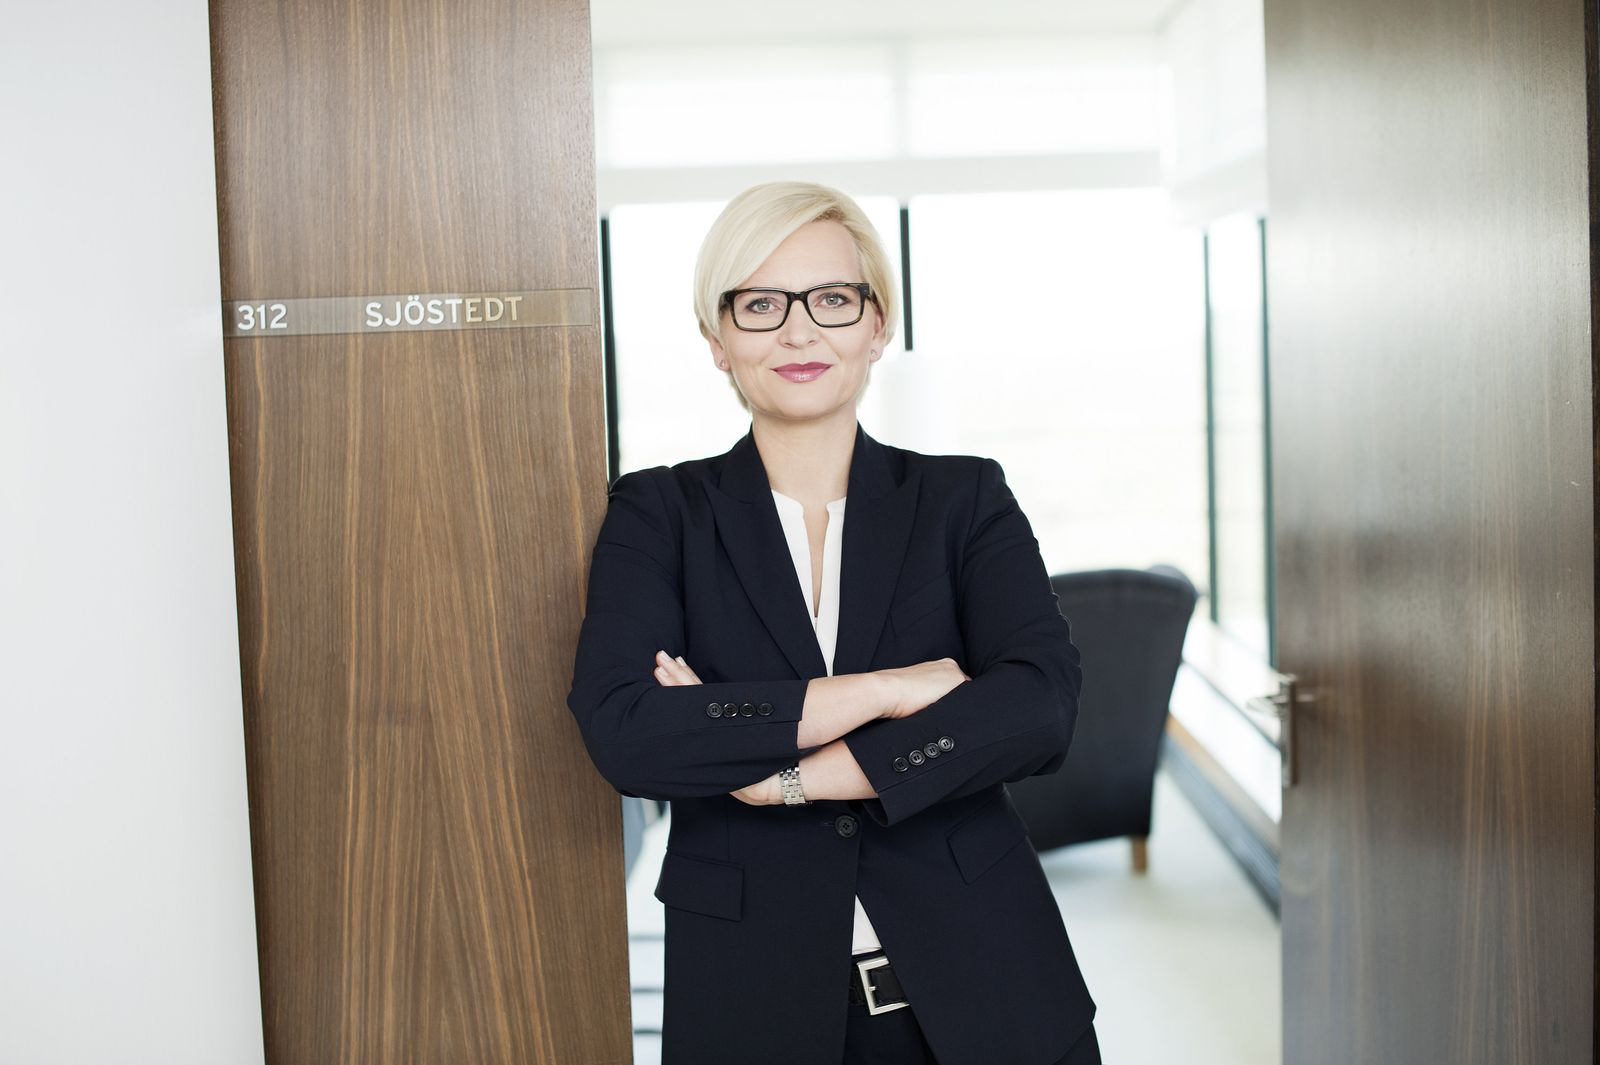 Eva Lotta Sjöstedt / Gewinner Verlierer